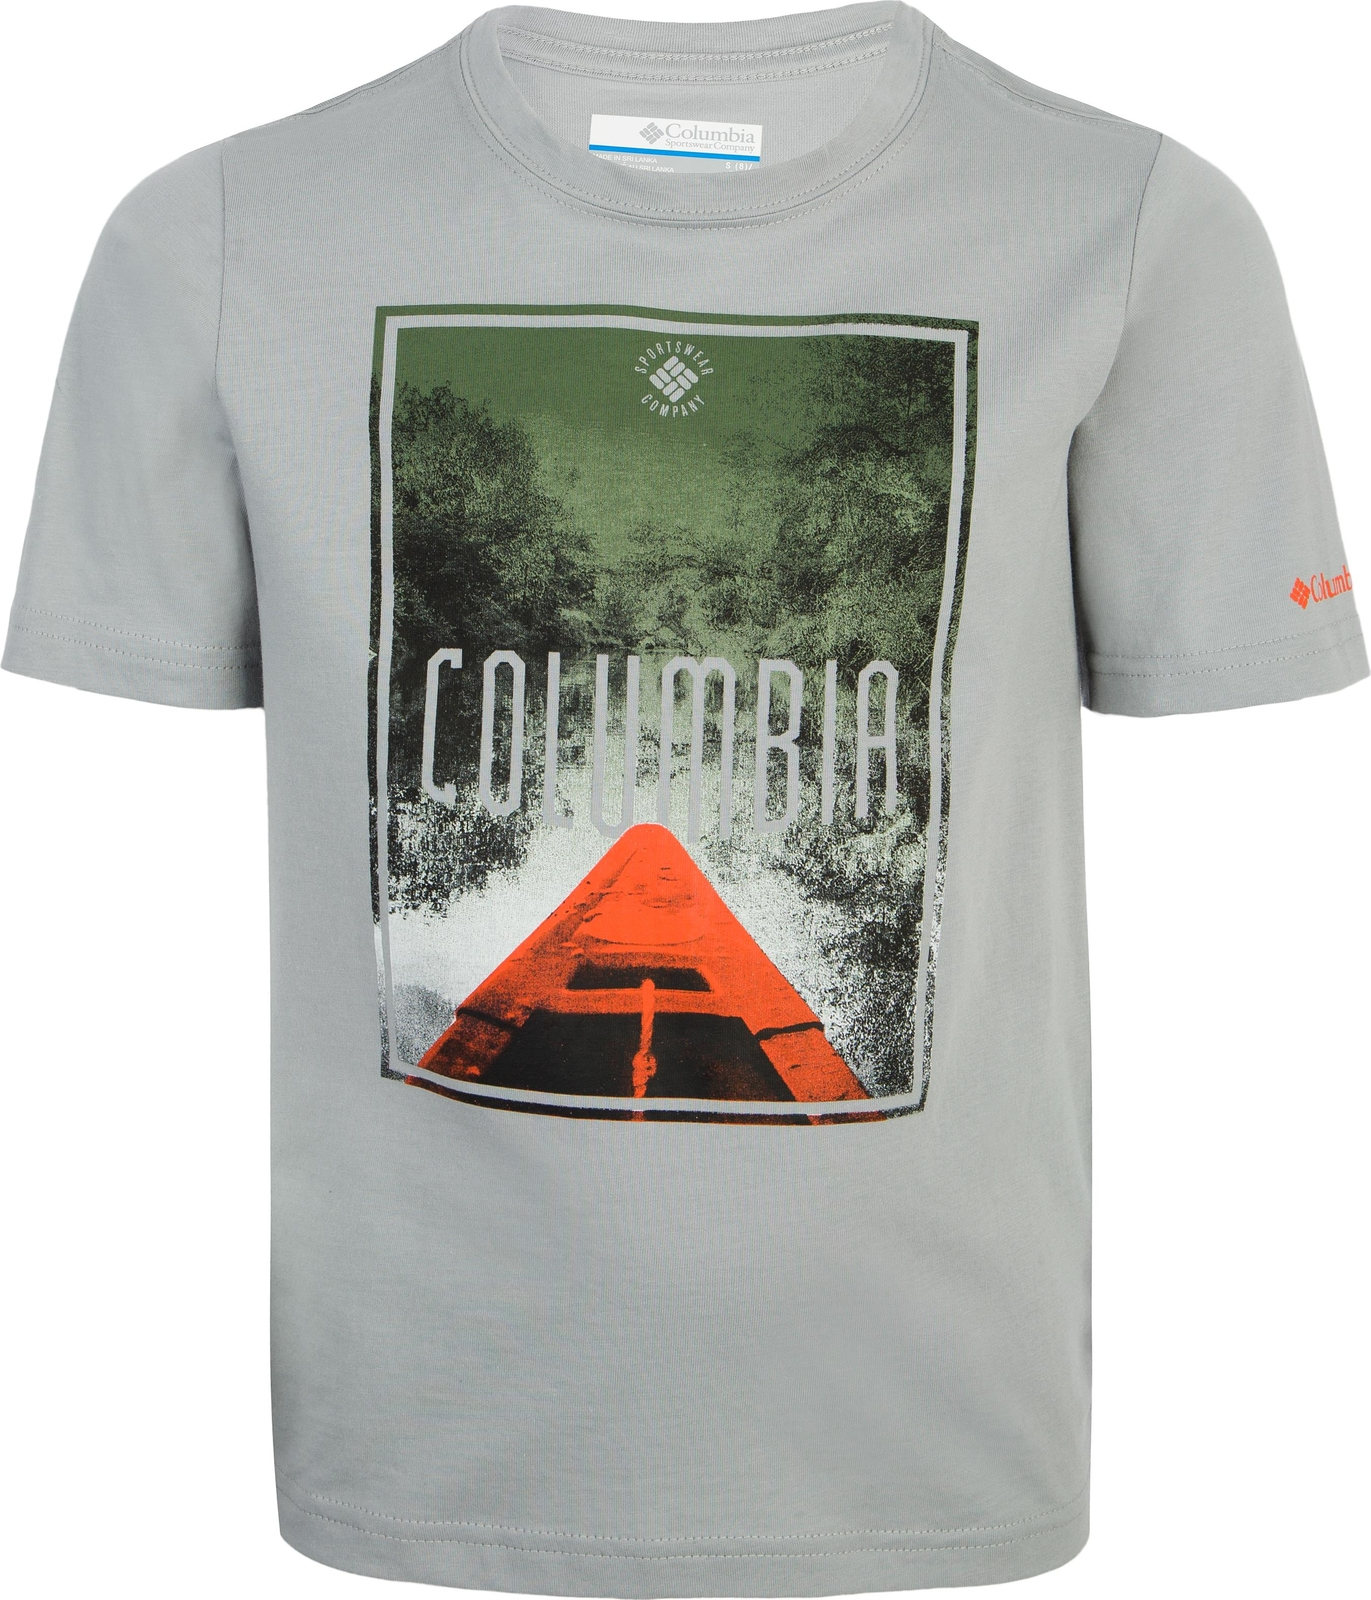 Футболка Columbia Camp Champ Short Sleeve Shirt штангенциркуль стрелочный matrix 150 мм 31601